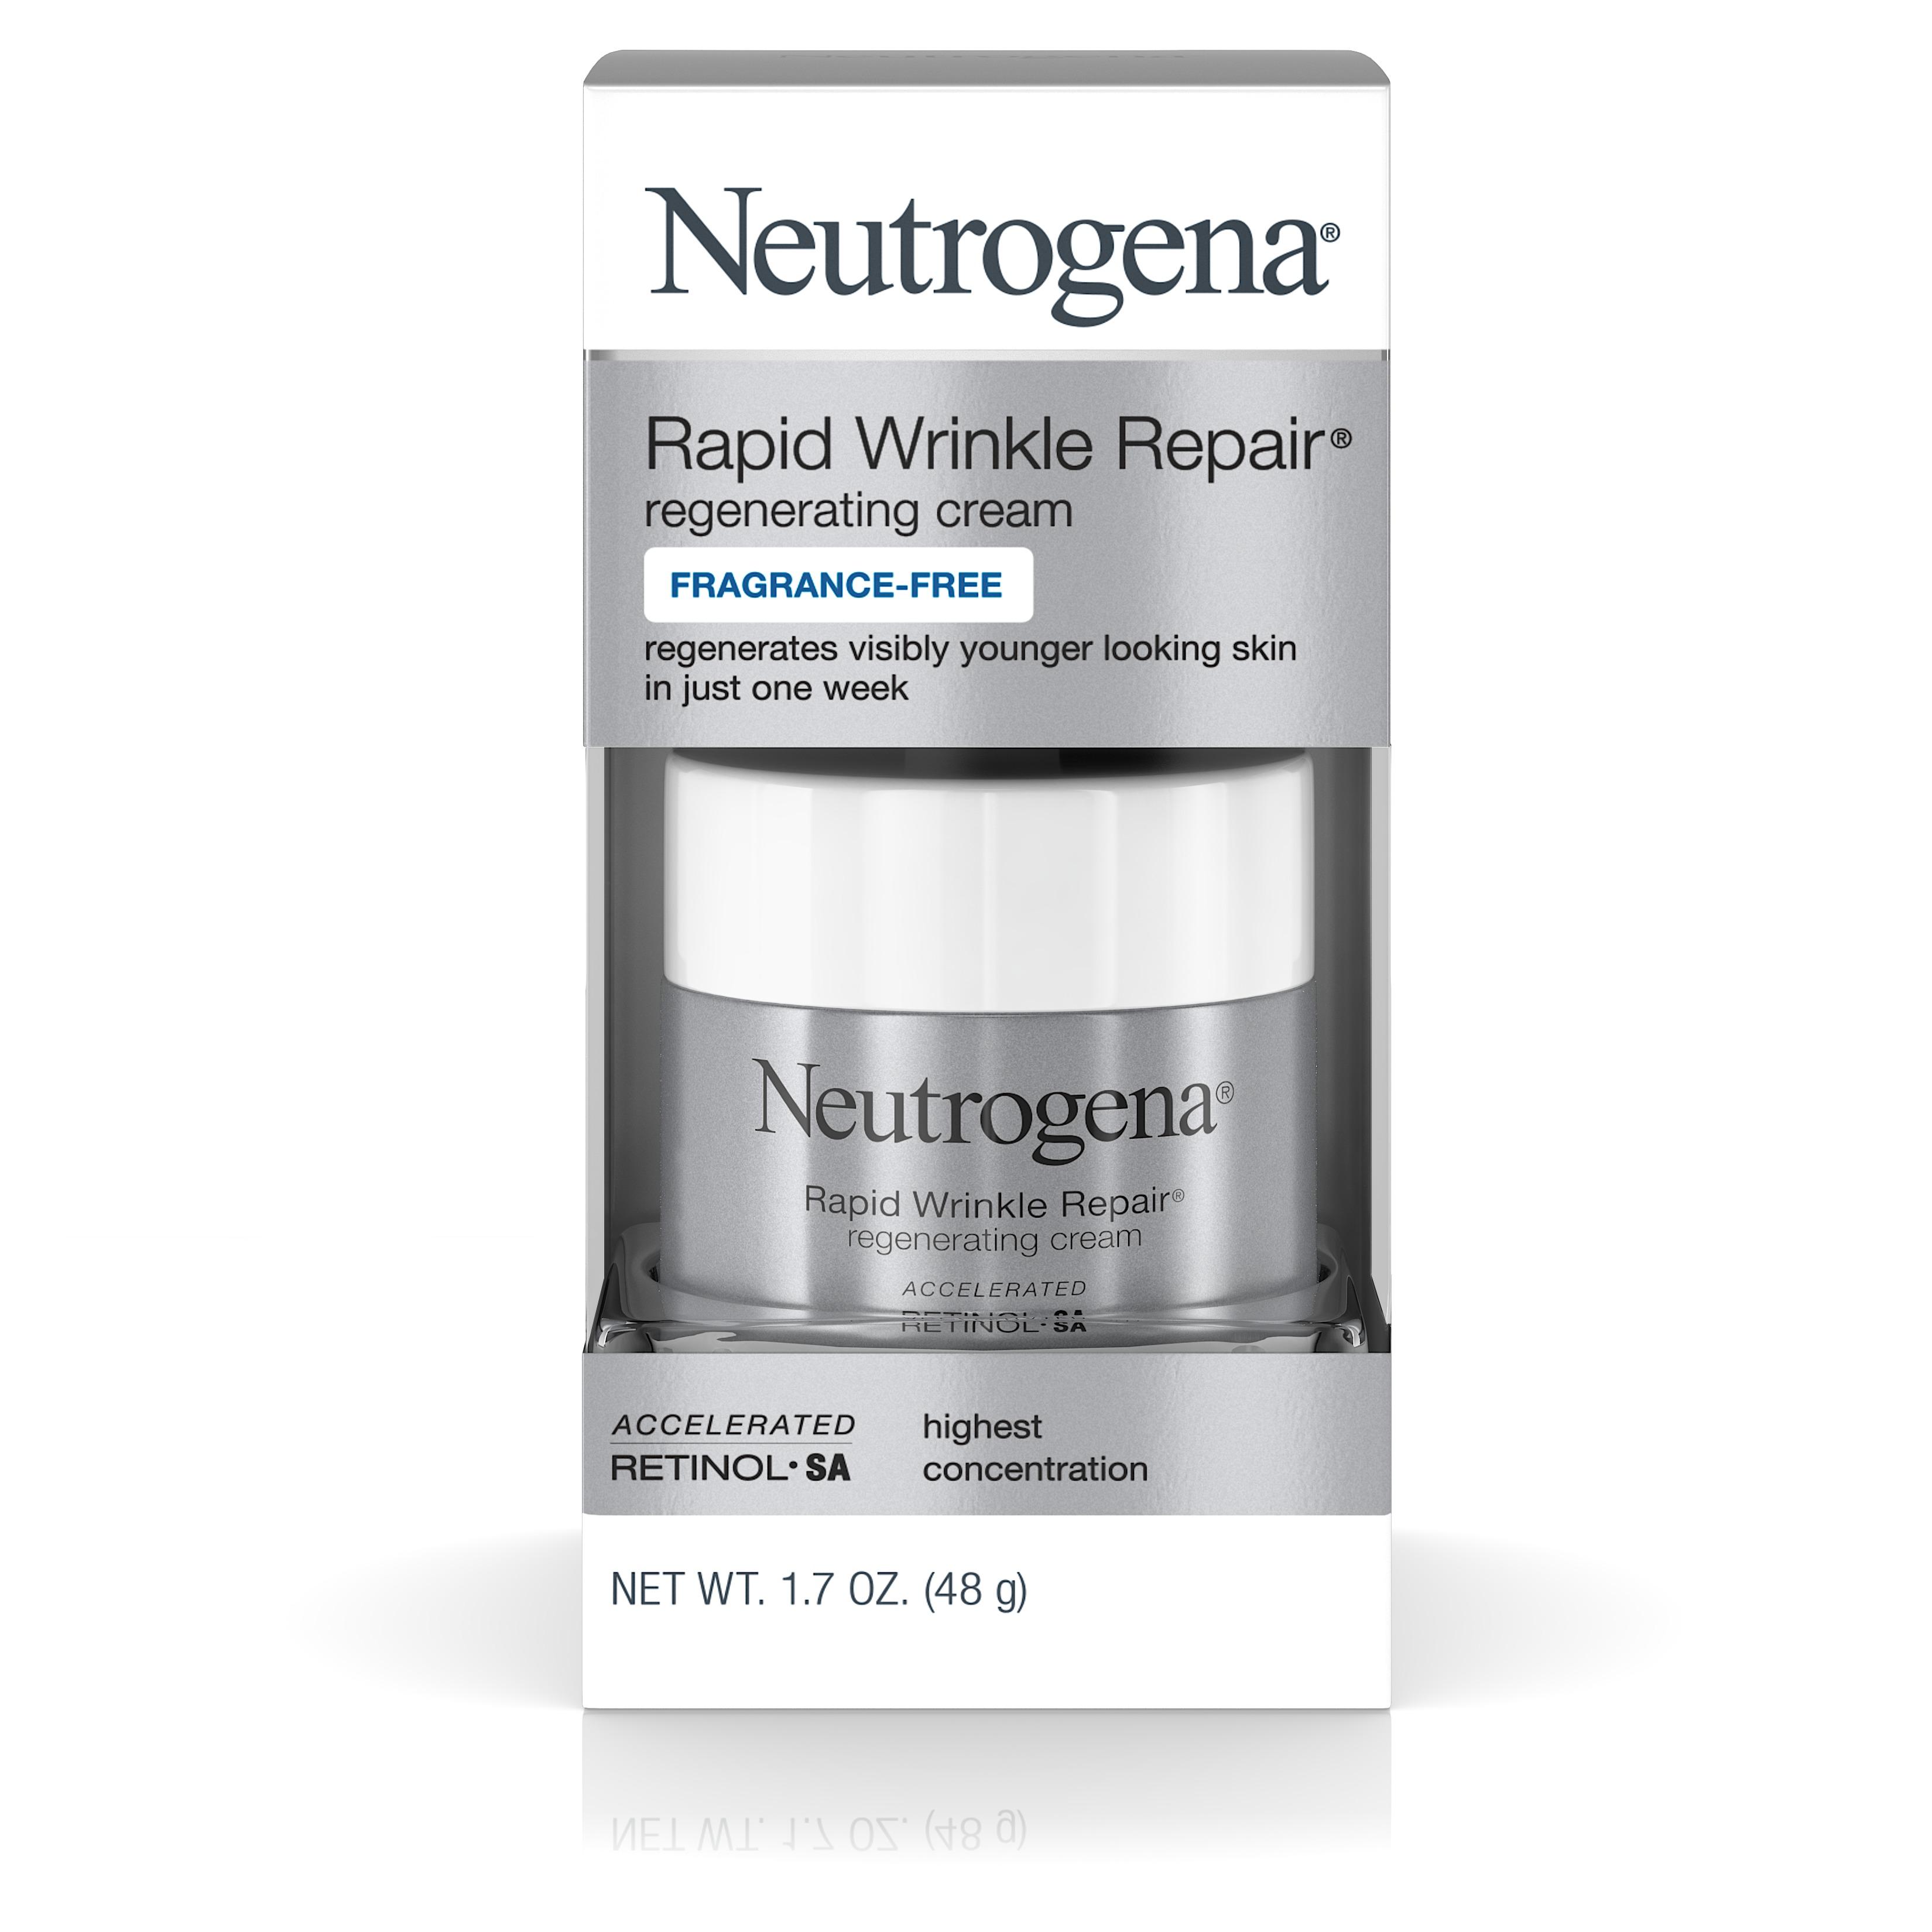 1.7 -Oz Neutrogena Rapid Wrinkle Repair Regenerating Cream w/ Hyaluronic Acid & Retinol $15.15 w/ S&S + Free S/H w/ Prime